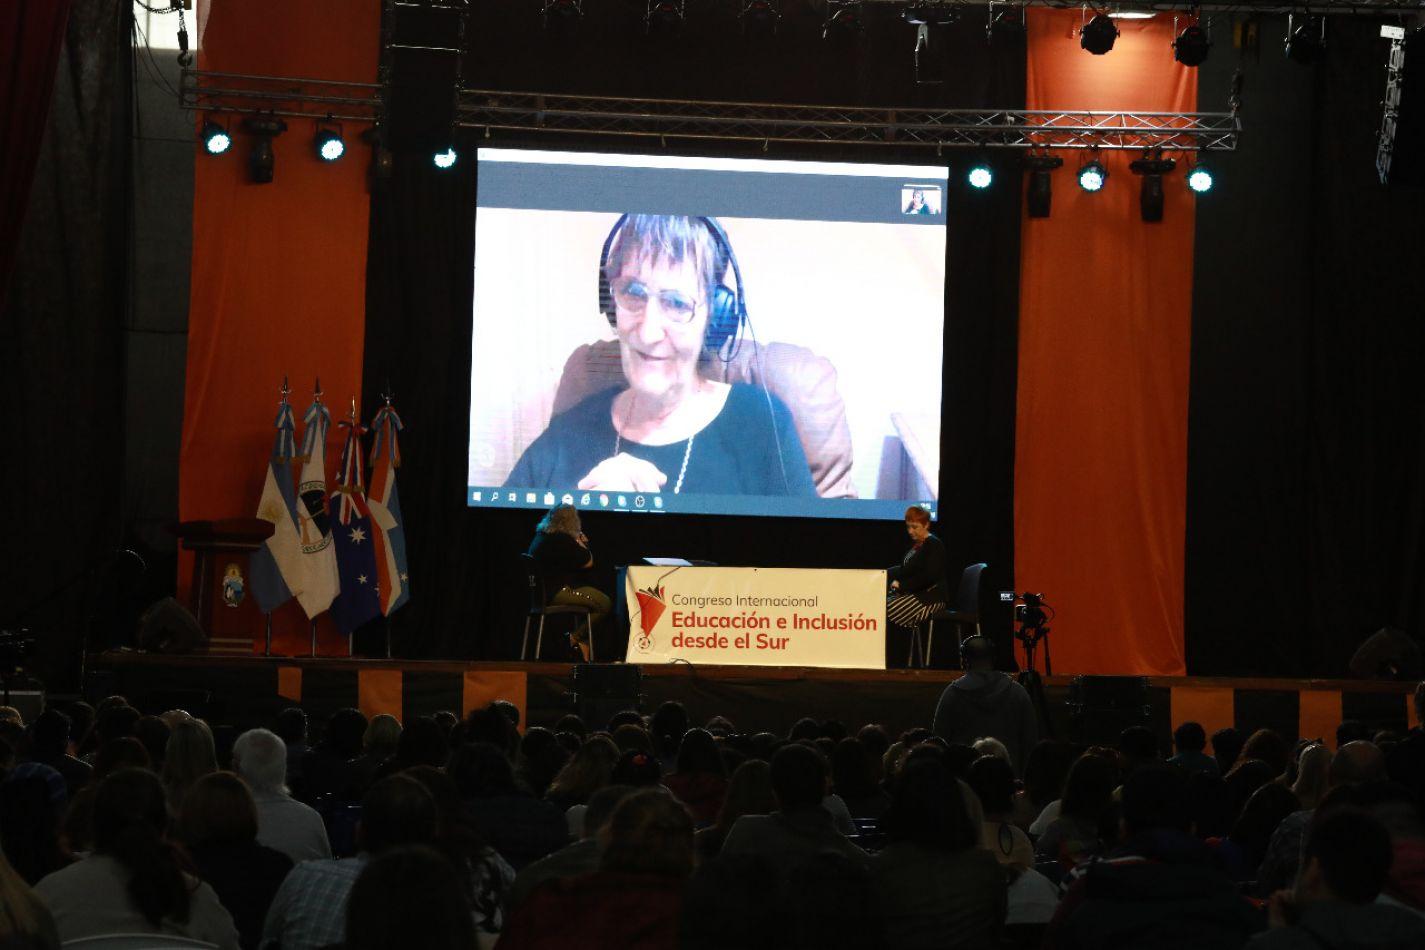 La sociologa australiana Raewyn Connell disertó por videoconferencia